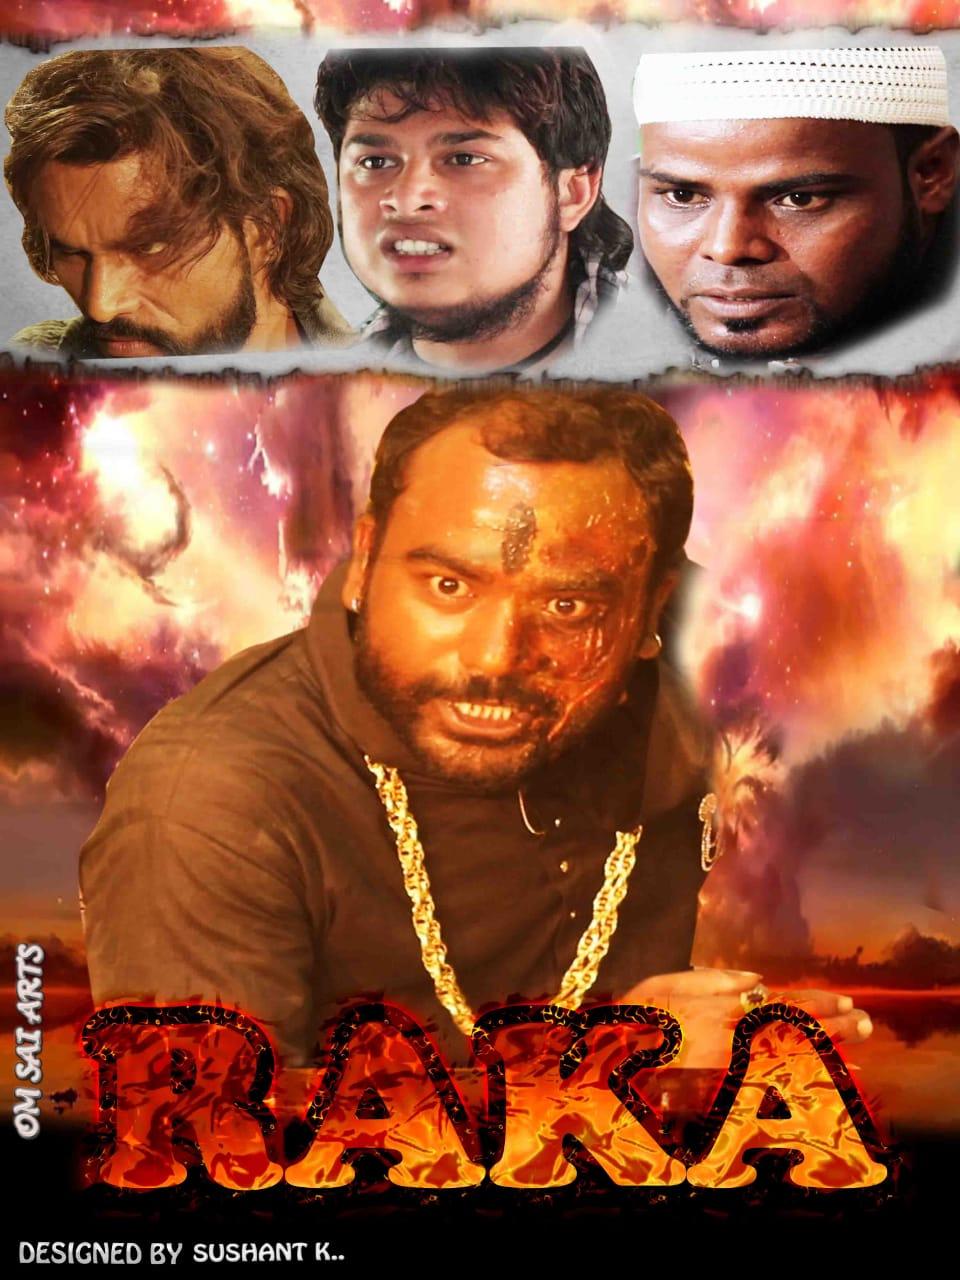 Raka Movie , Raka Hindi Movie, RAKA Film, Dhananjay Mukherjee, Asansol Film, Asansol Film Industry, Anubhav Kumar, Raka Film Poster, Film Poster Raka